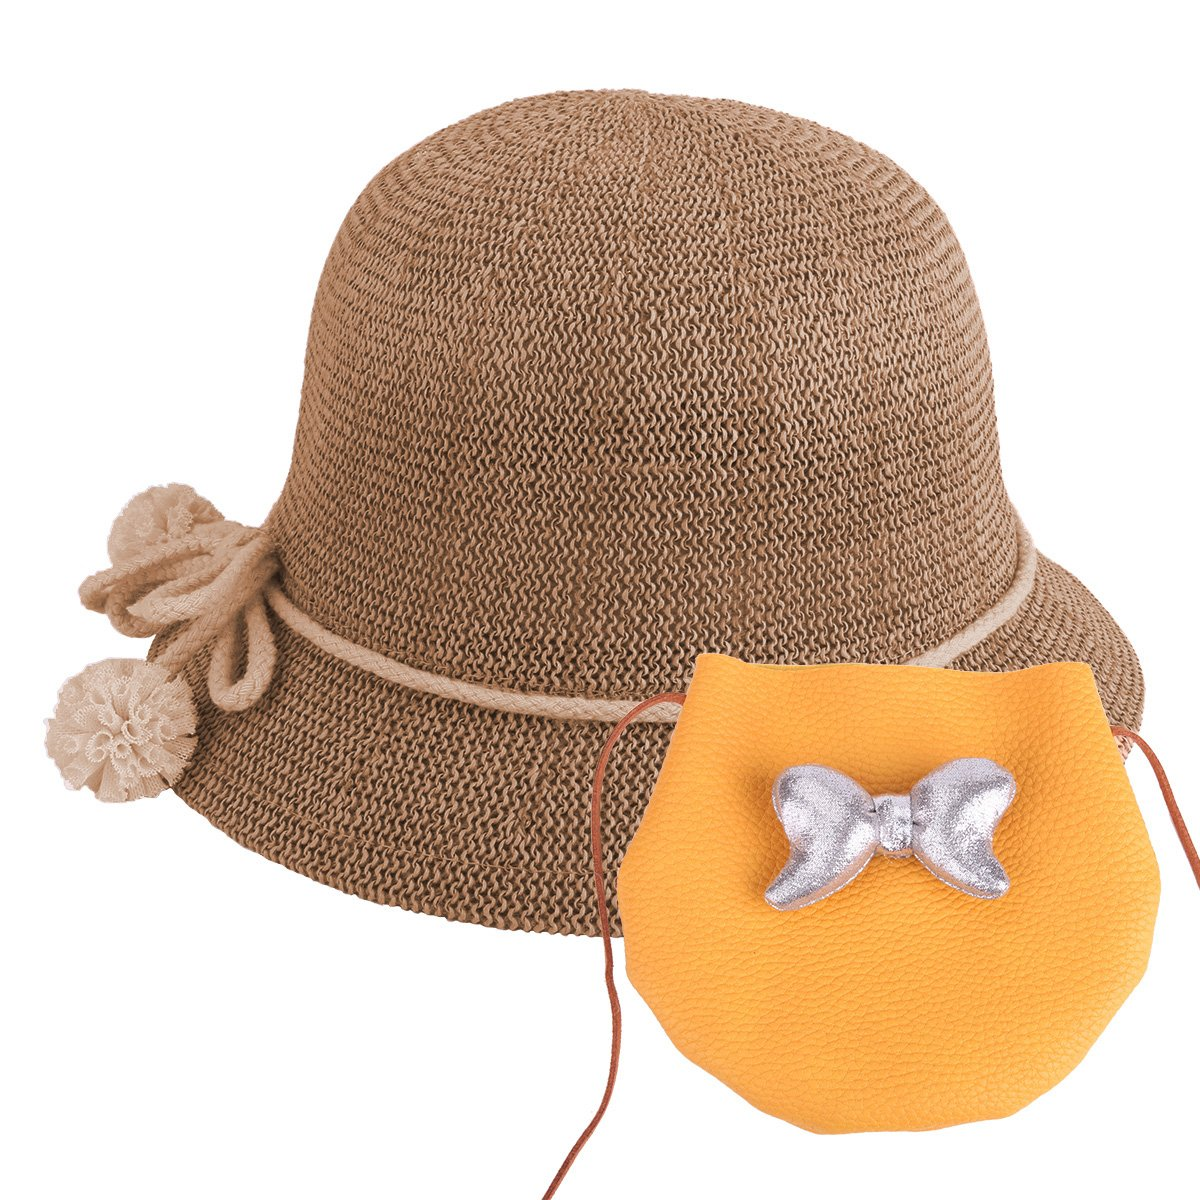 Sombrero de Paja para bebé s Sombrero de Verano para niñ as Sombrero Set Beach Floppy Hats Sombrero de niñ os para Sol con Bolsa (Amarillo)